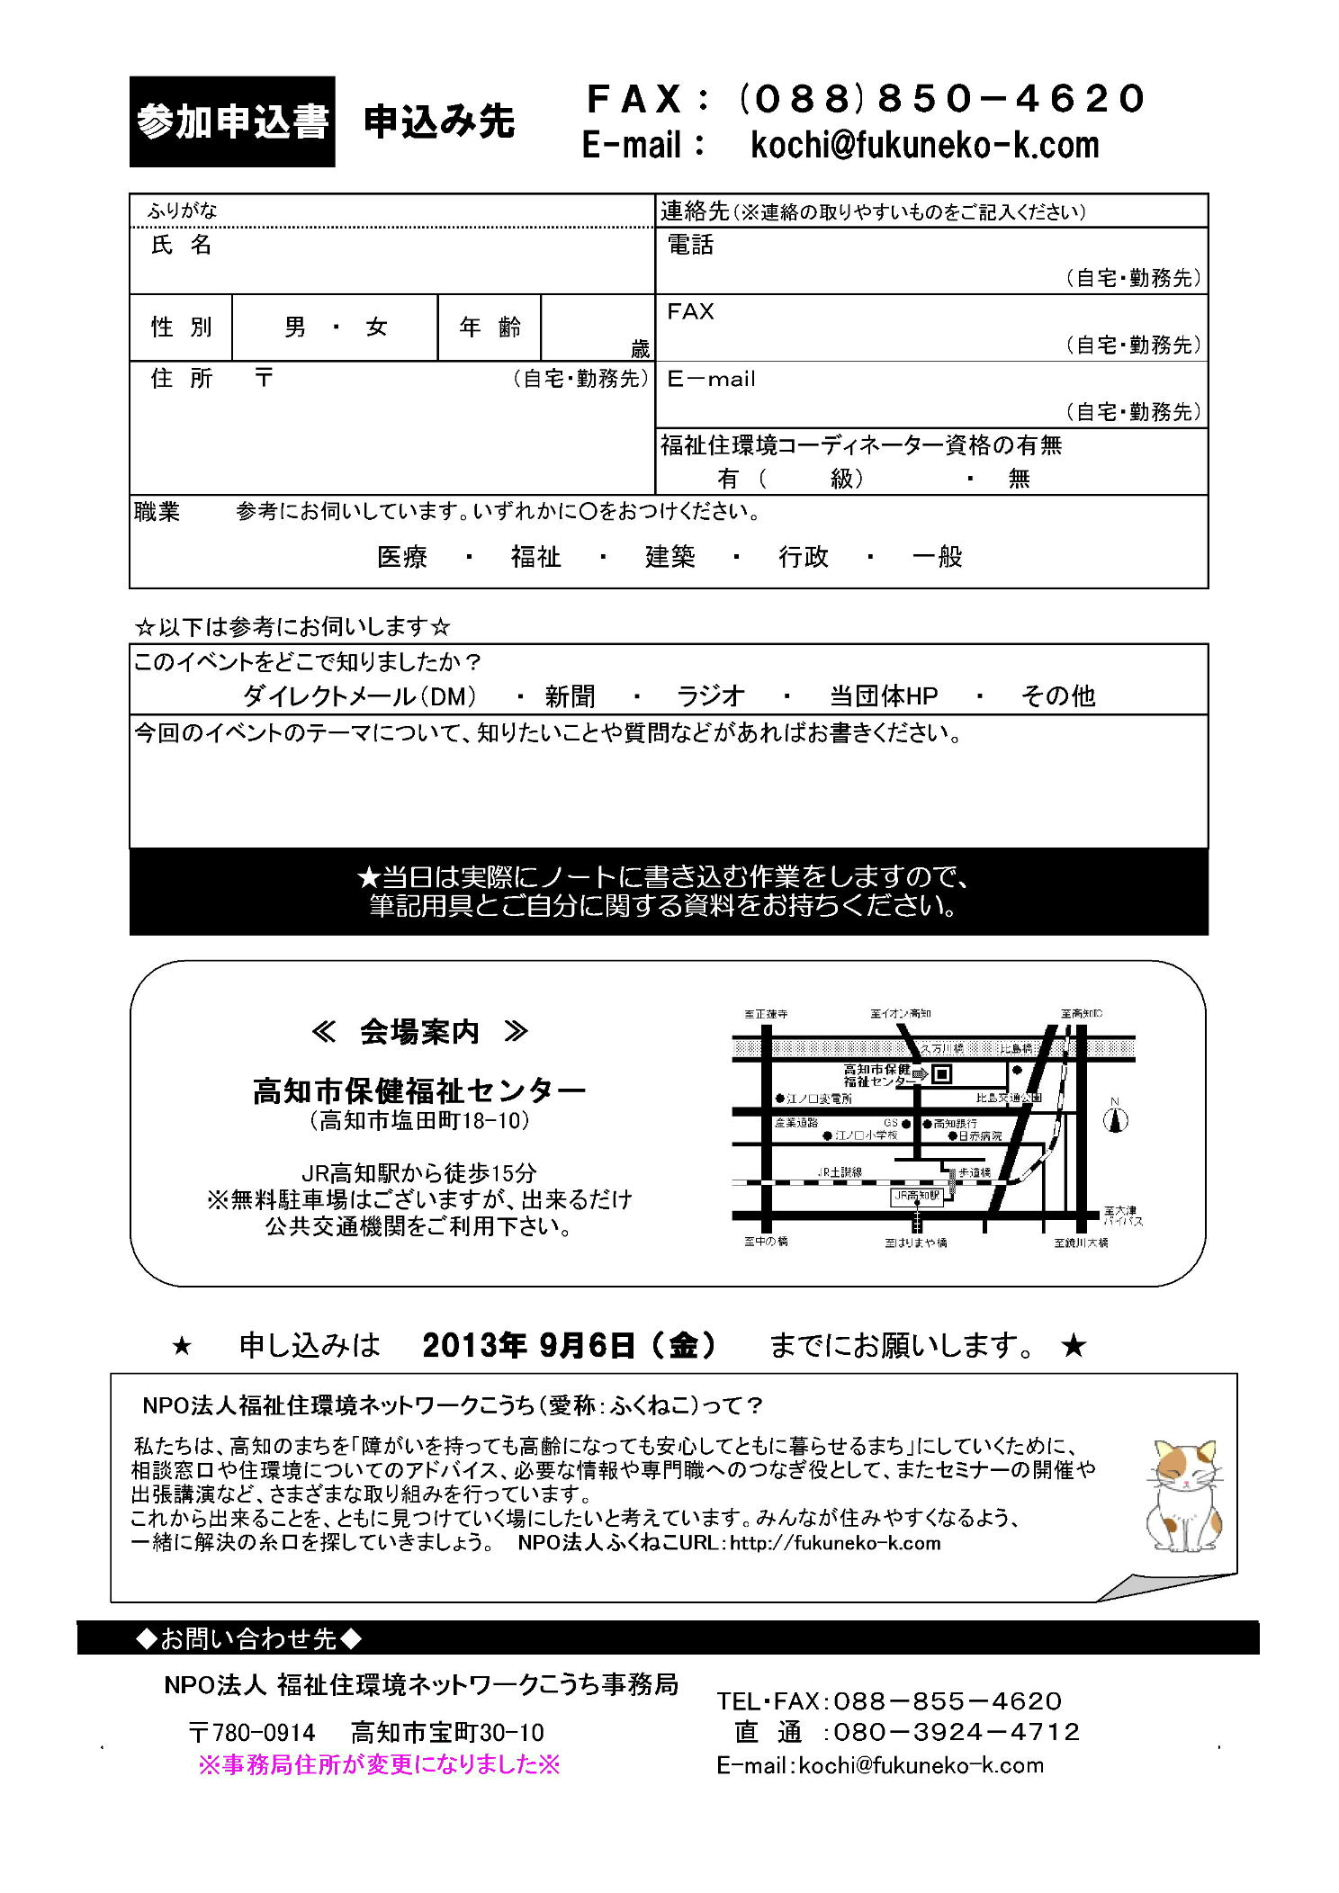 2013TM ちらし(最終)-2